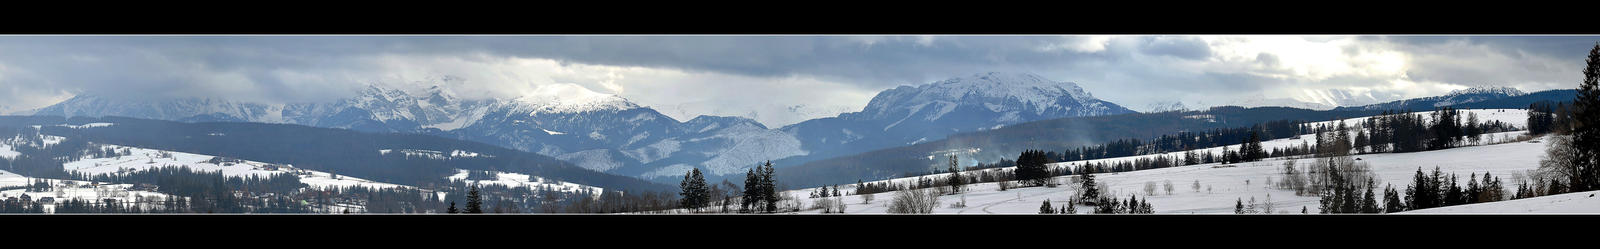 Saturday At Foot Of The Tatra Mountains - Panorama by skarzynscy